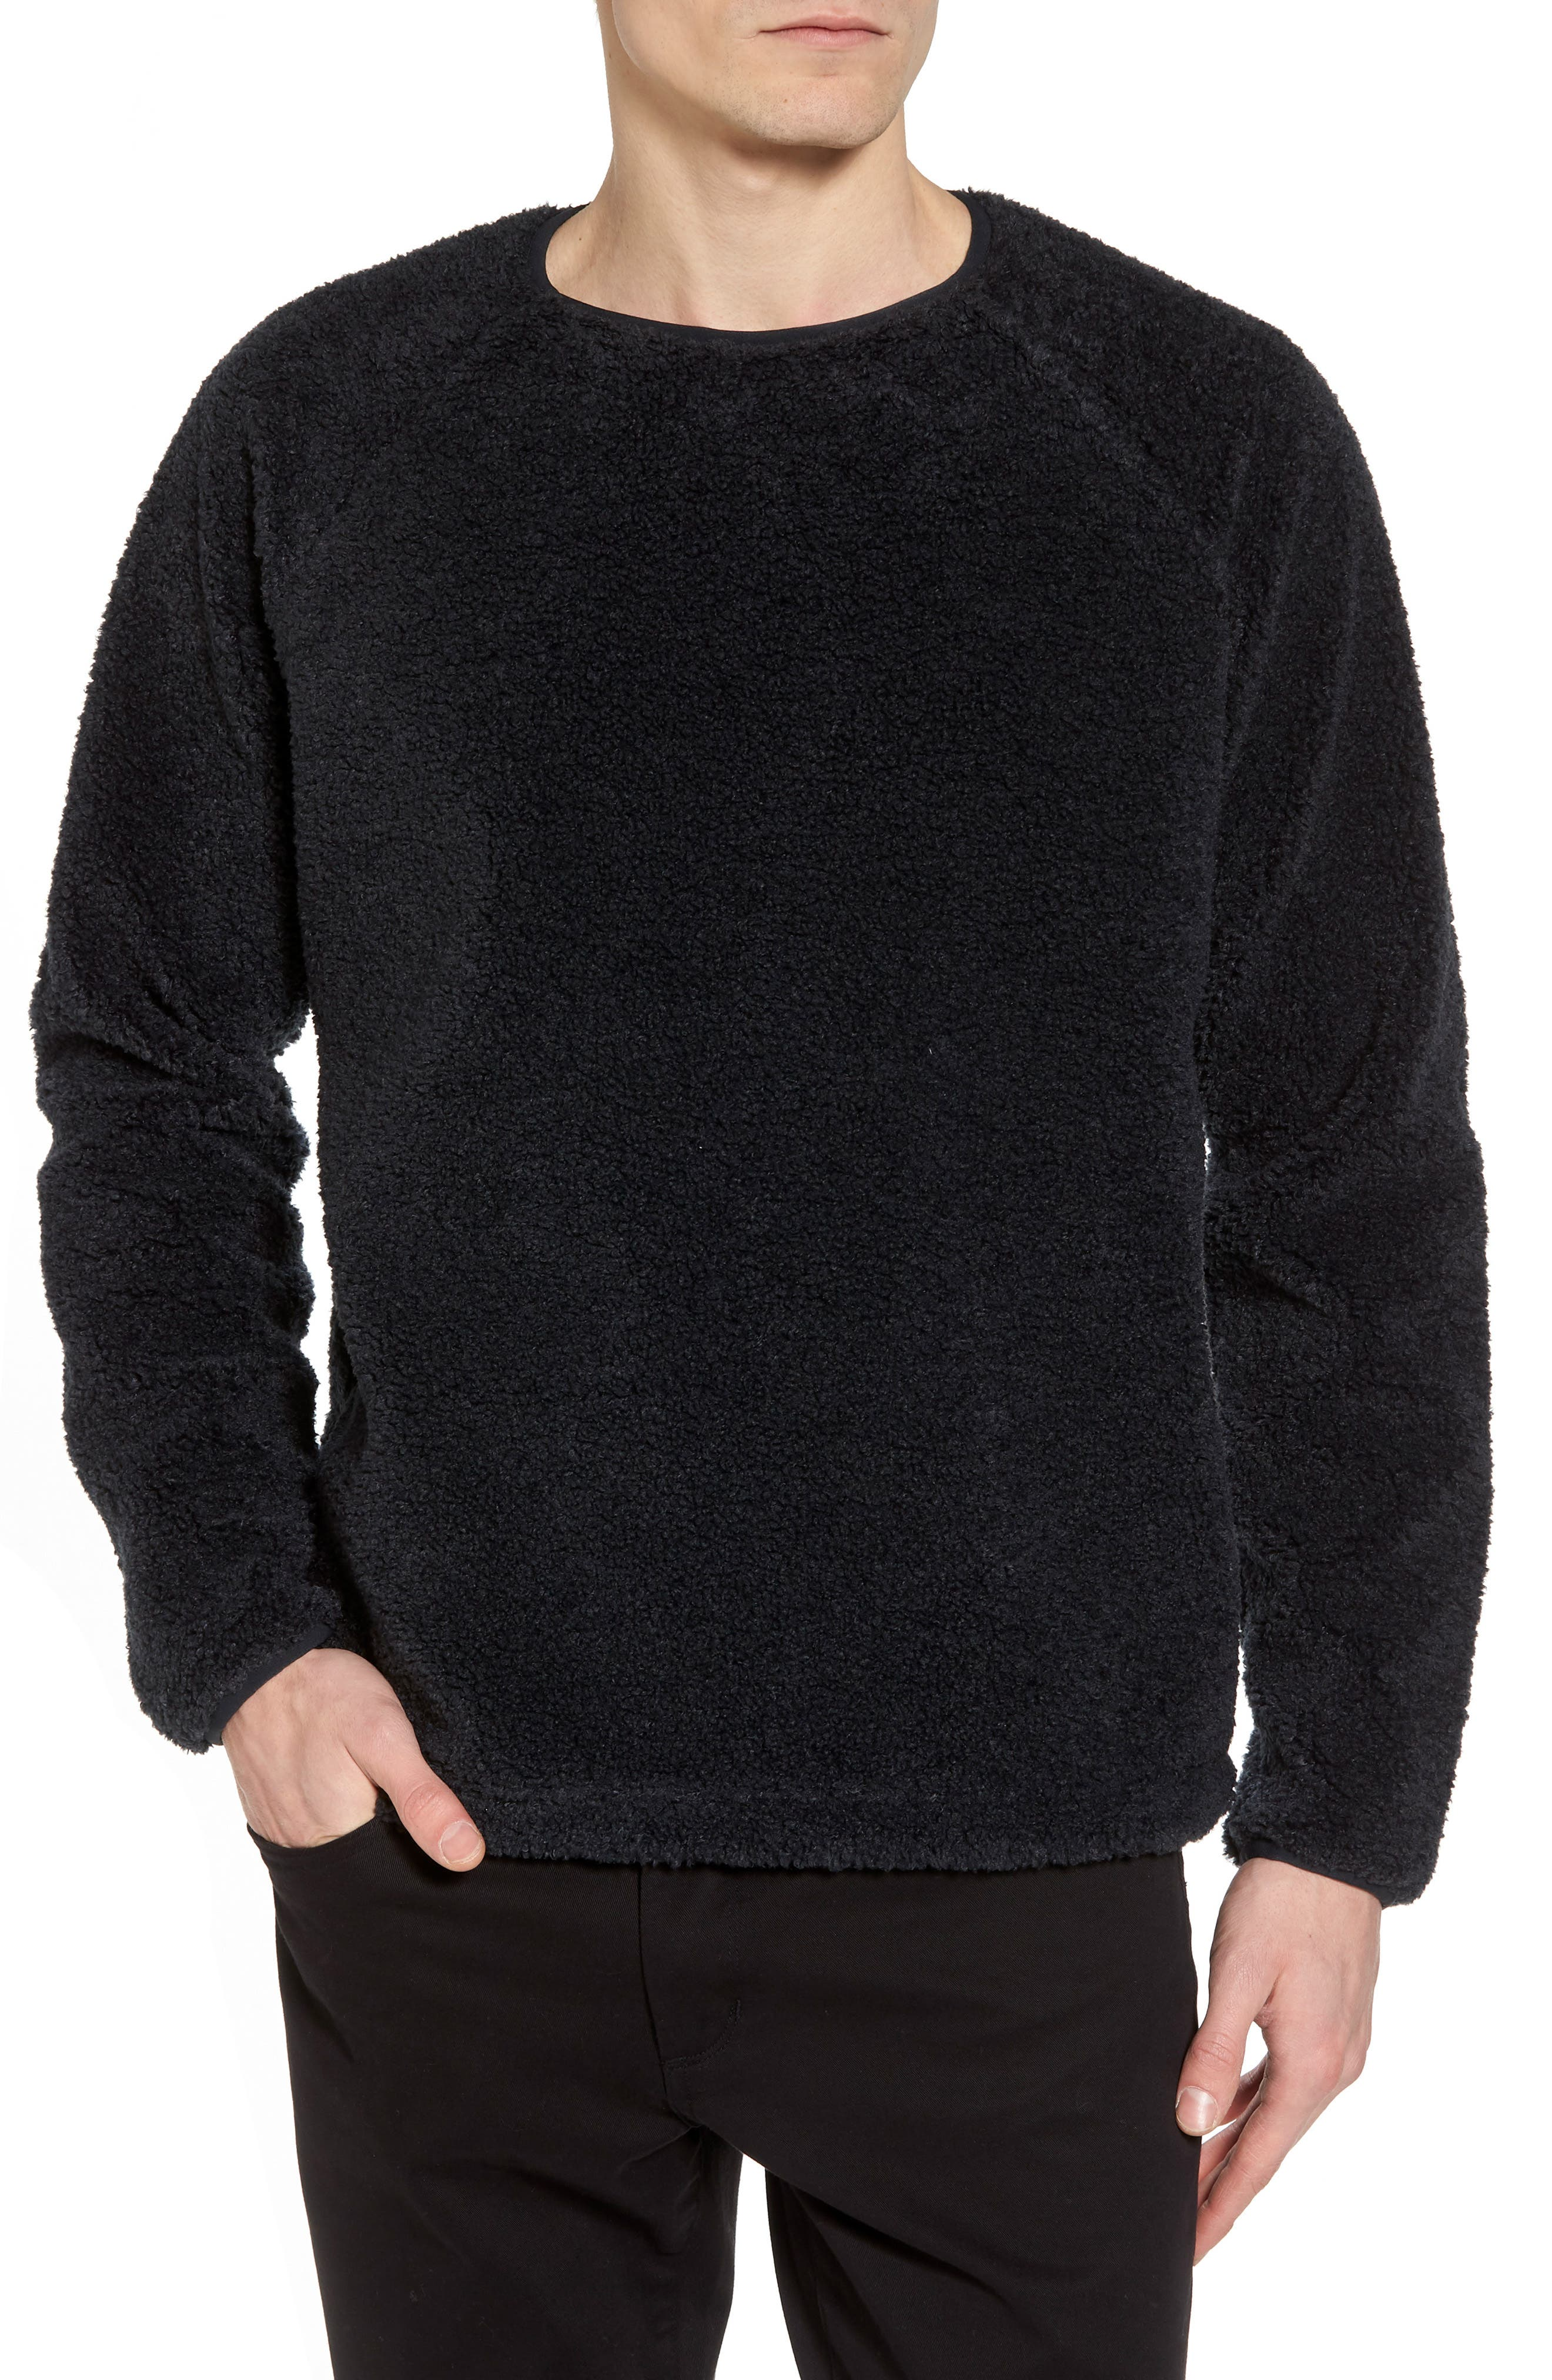 YMC Deliverance Fleece Sweatshirt